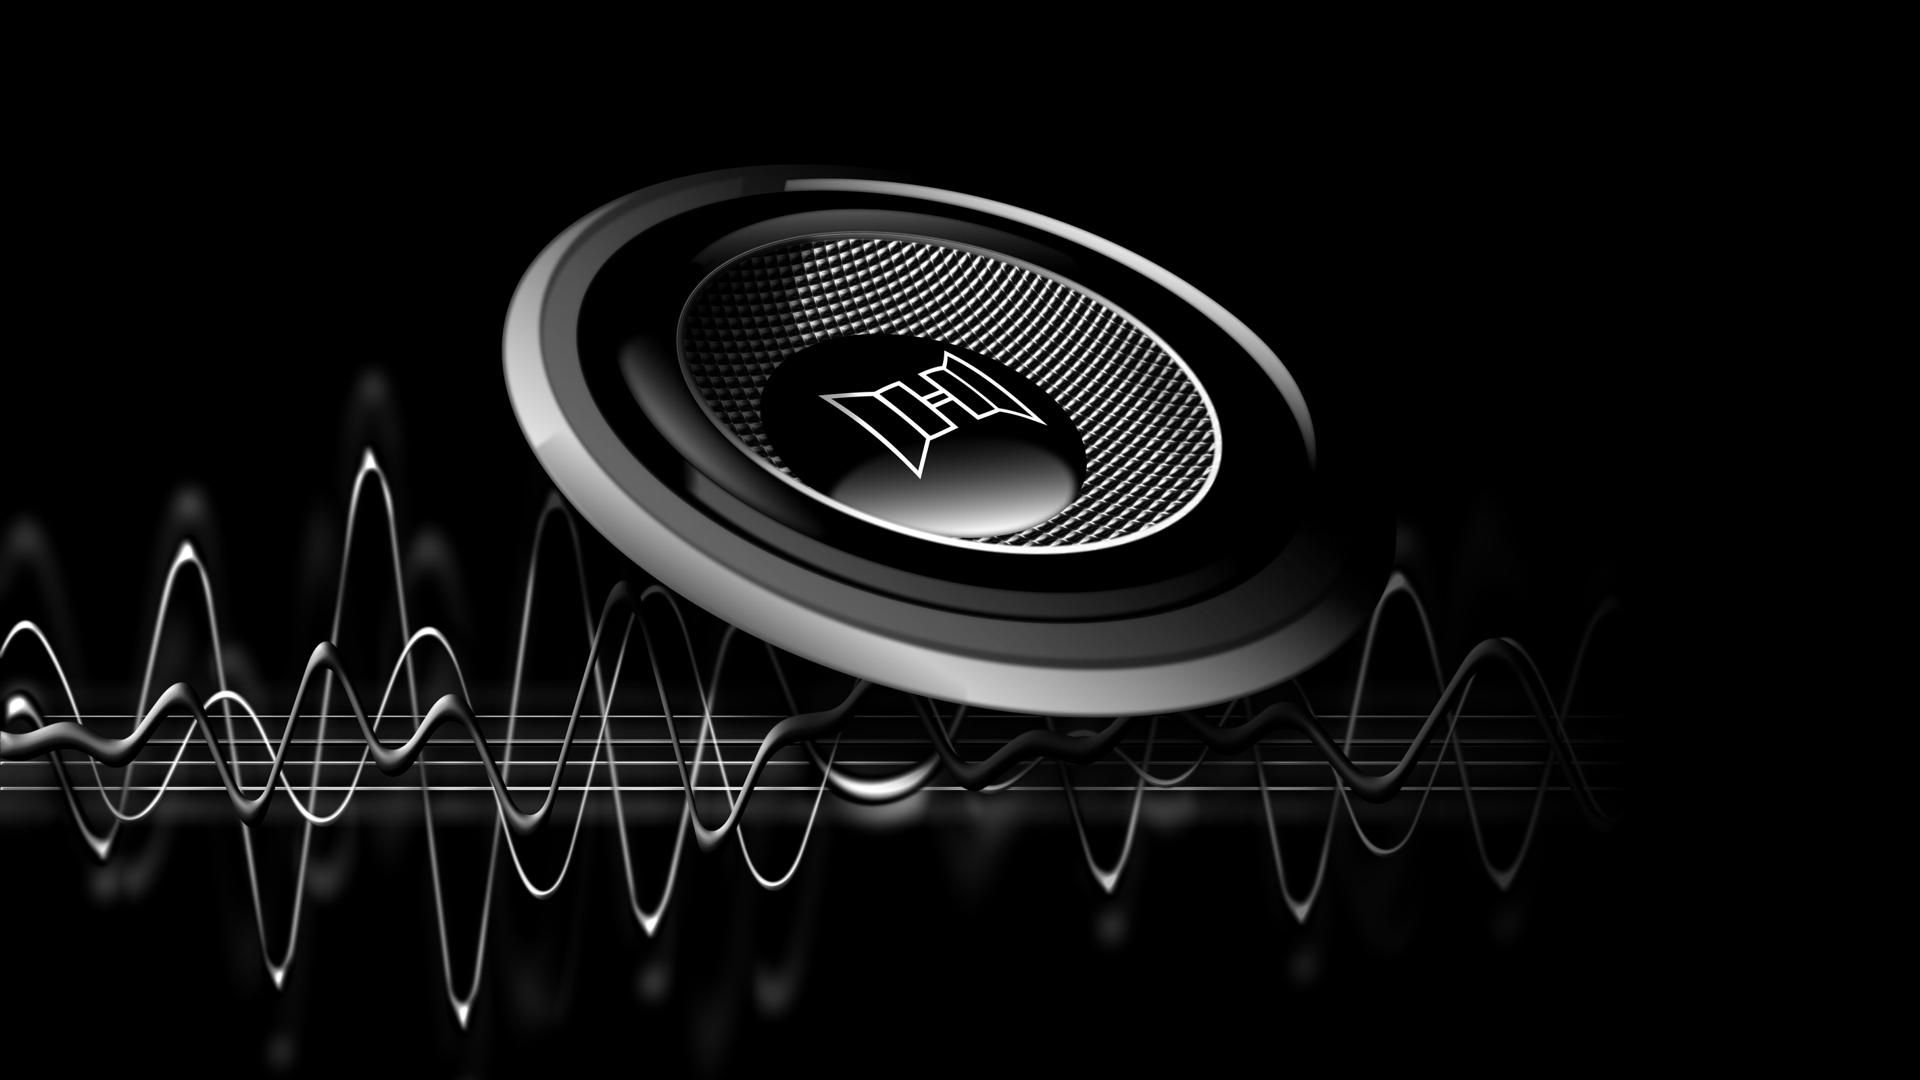 Dj Background Download Free Beautiful Full Hd: Music Wallpaper Widescreen HD